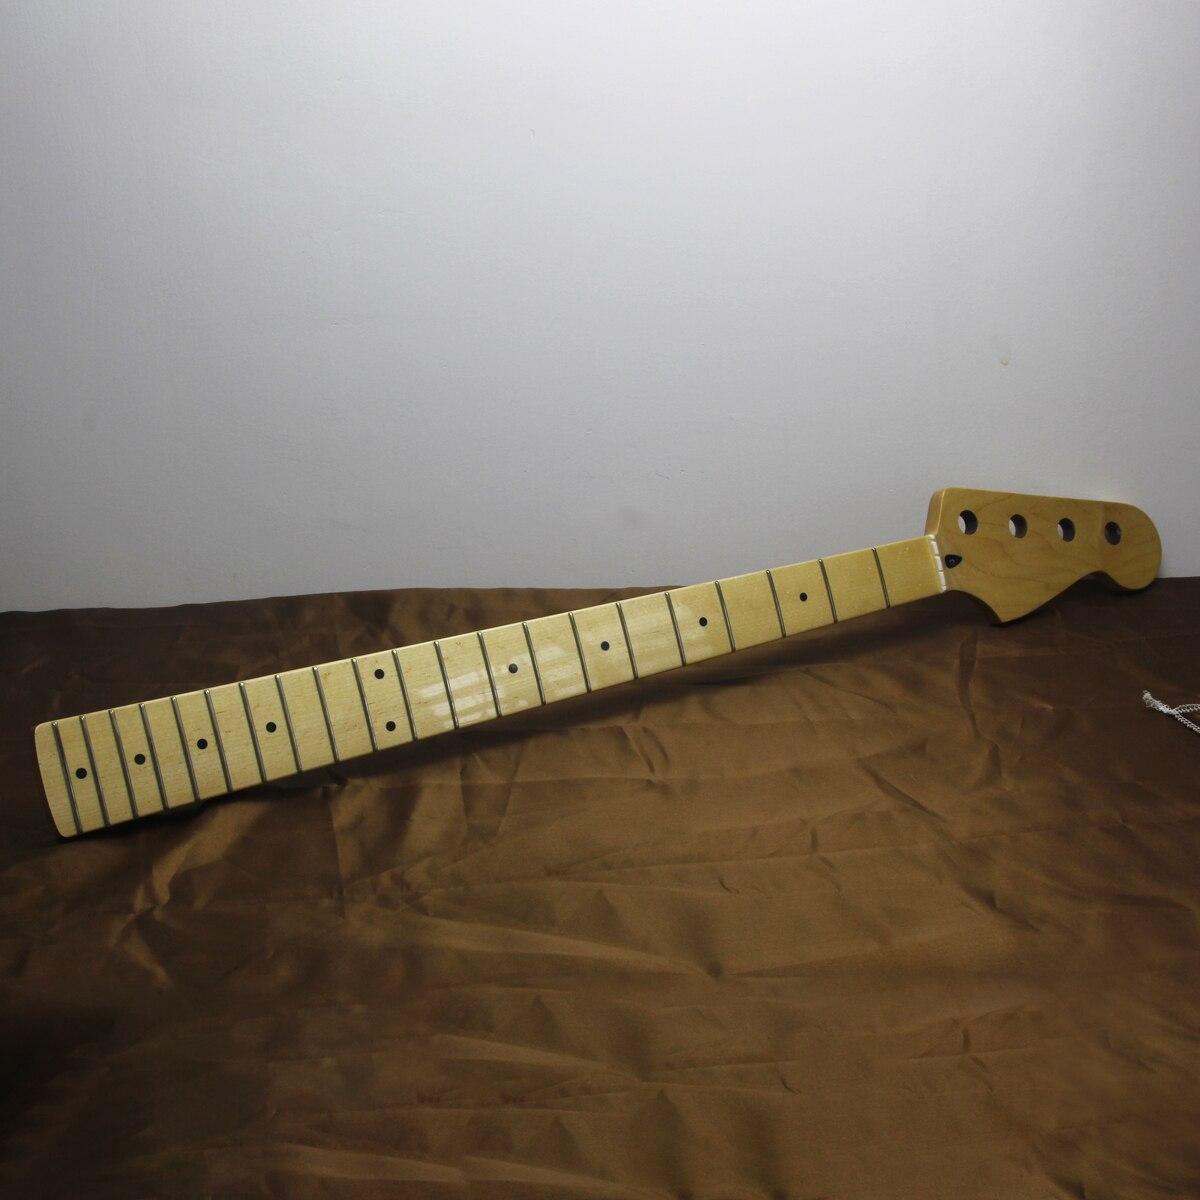 FLEOR 1 шт. 21 лада Бас шеи клен гриф блеск сатин для PB JB бас гитары шеи части замены - 6